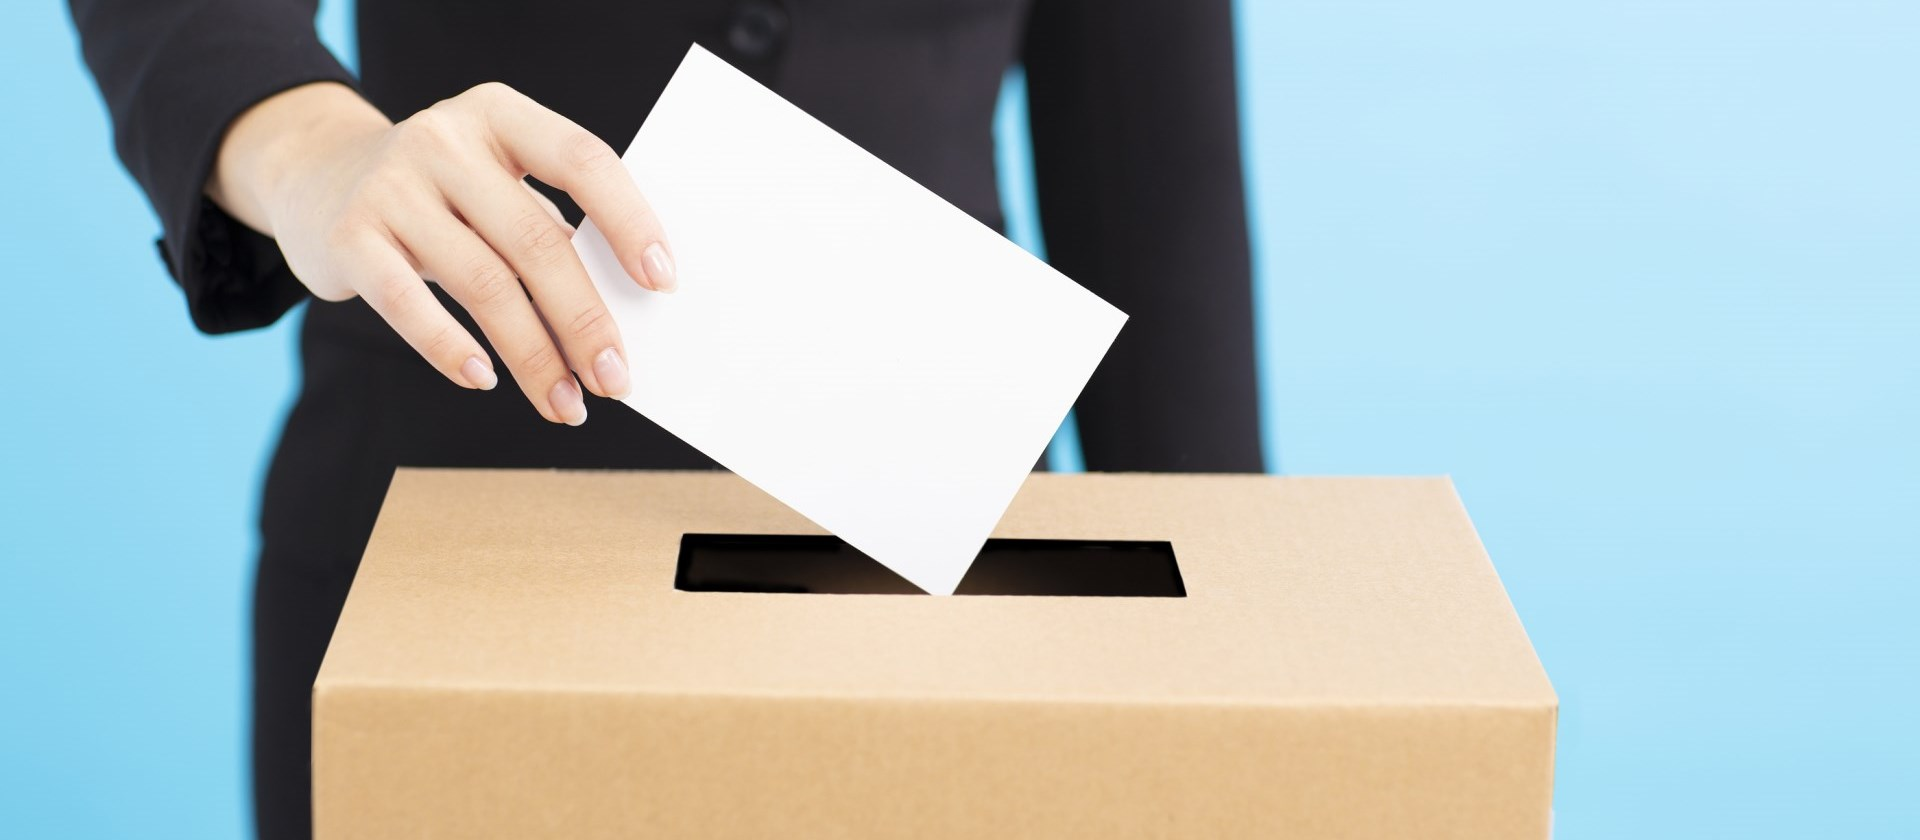 RLA has published its own election manifesto… - https://roomslocal.co.uk/blog/rla-has-published-its-own-election-manifesto #published #election #manifesto